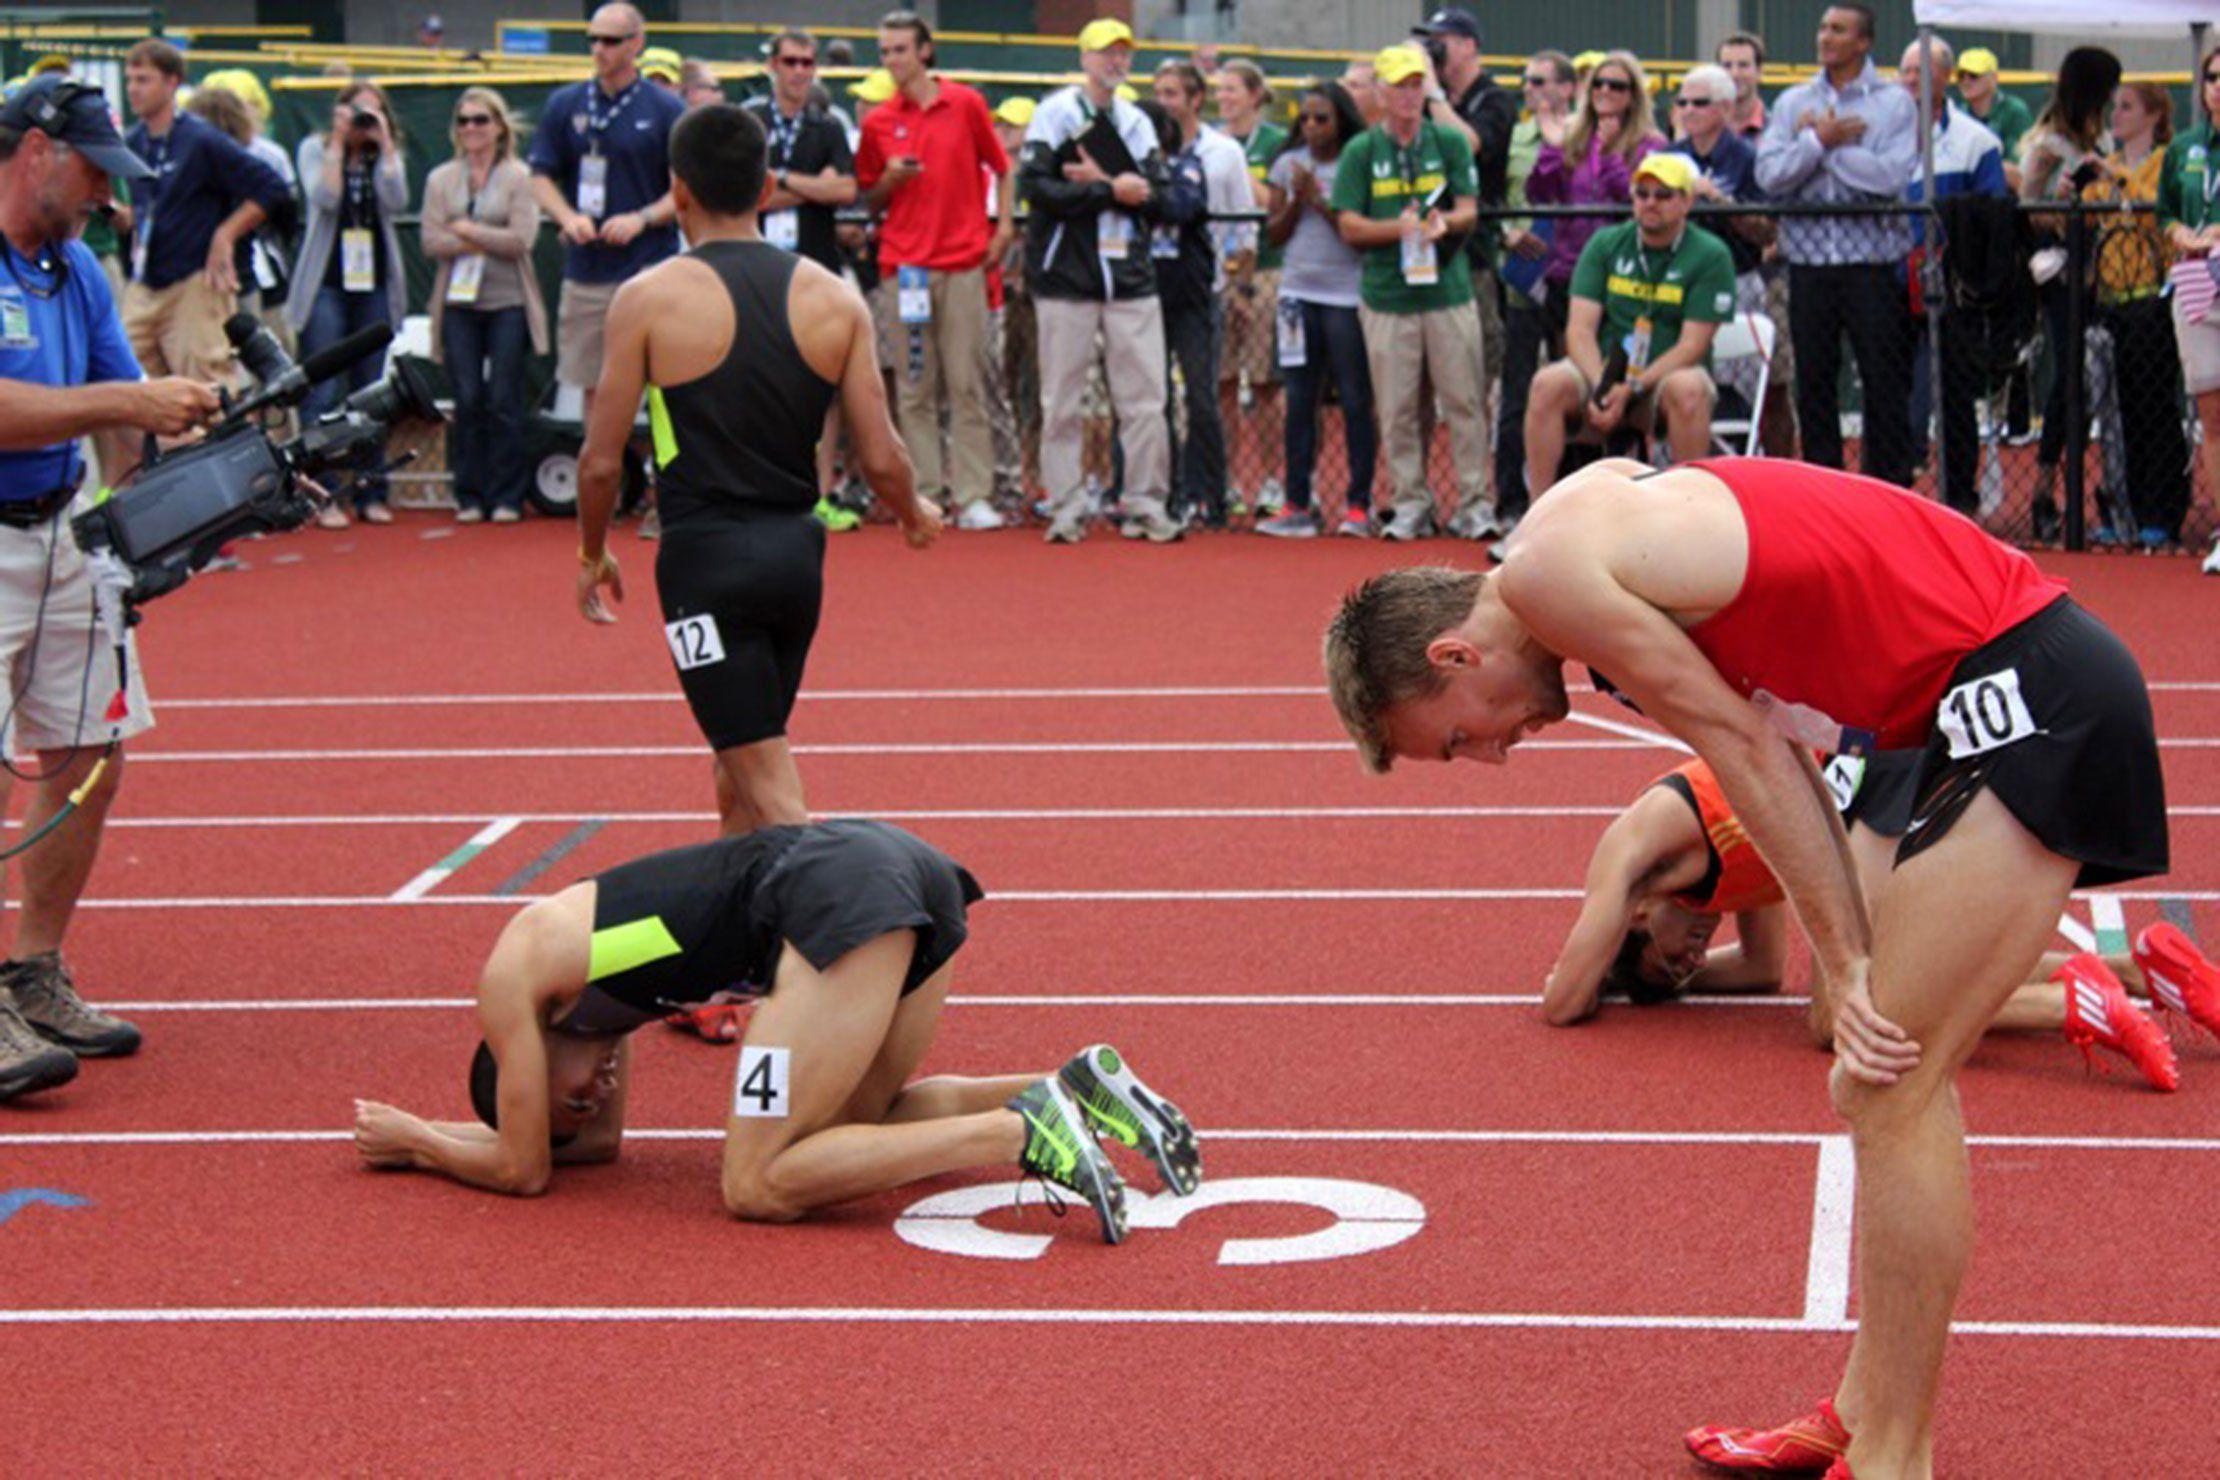 5 Reasons That Running Can Make You Puke | Runner's World